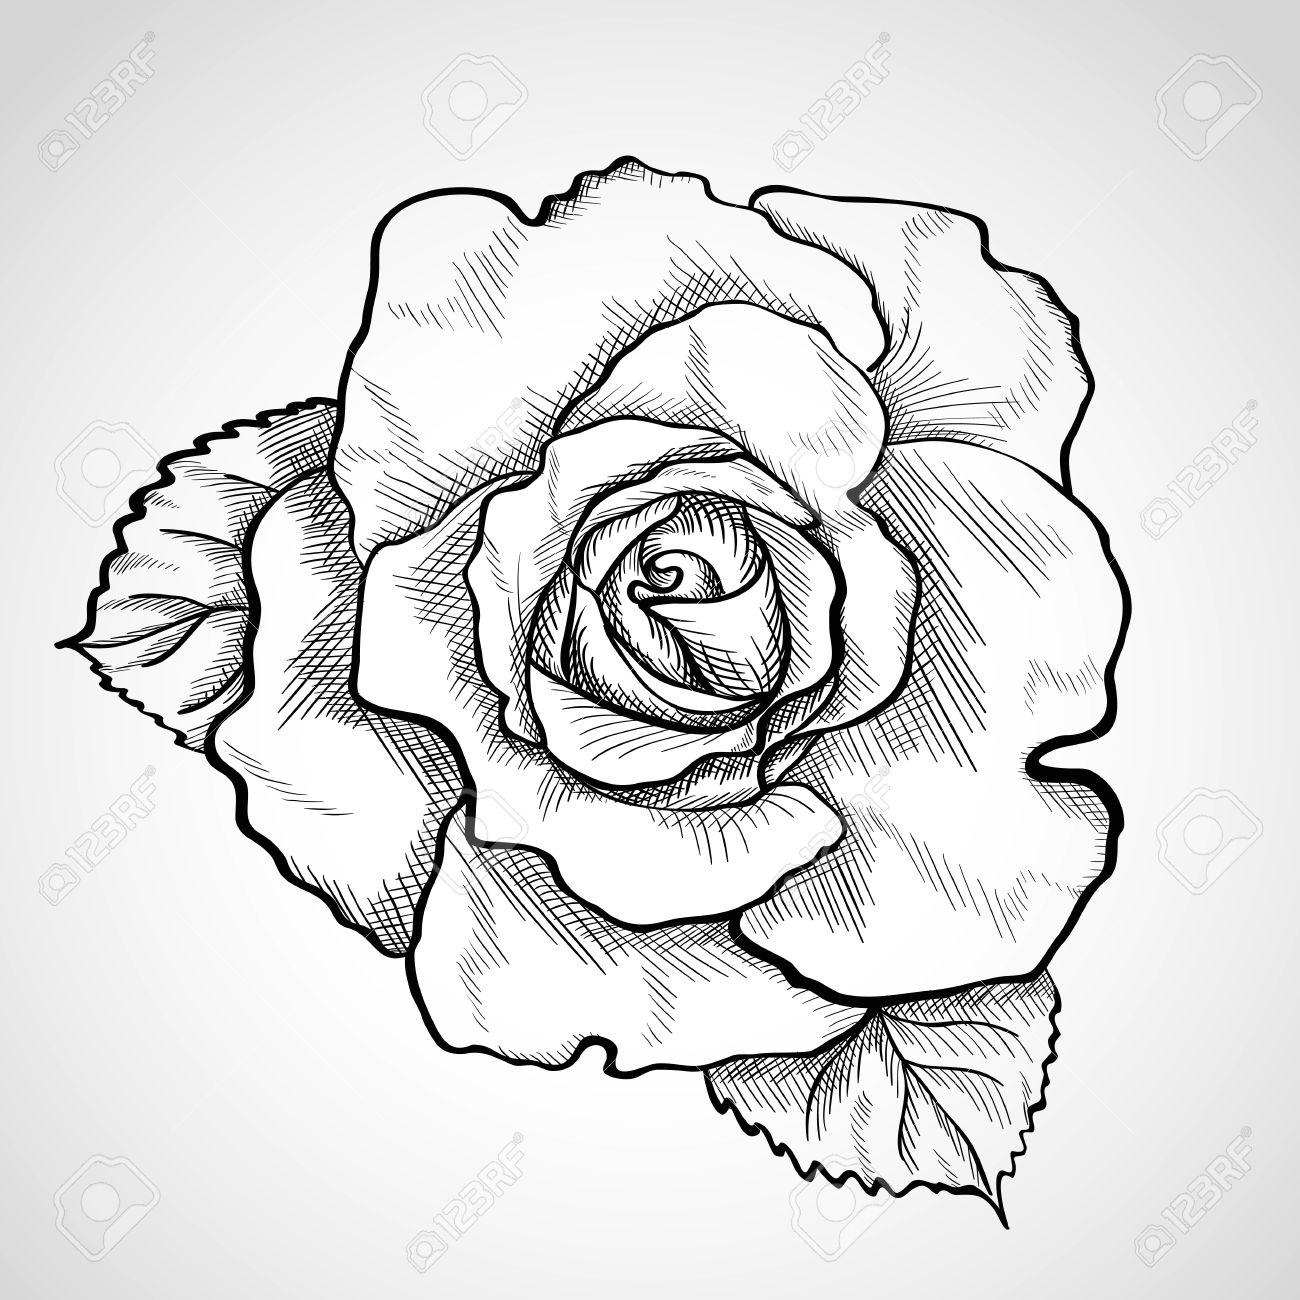 1300x1300 Hoontoidly Rose Drawings In Pencil Outline Images